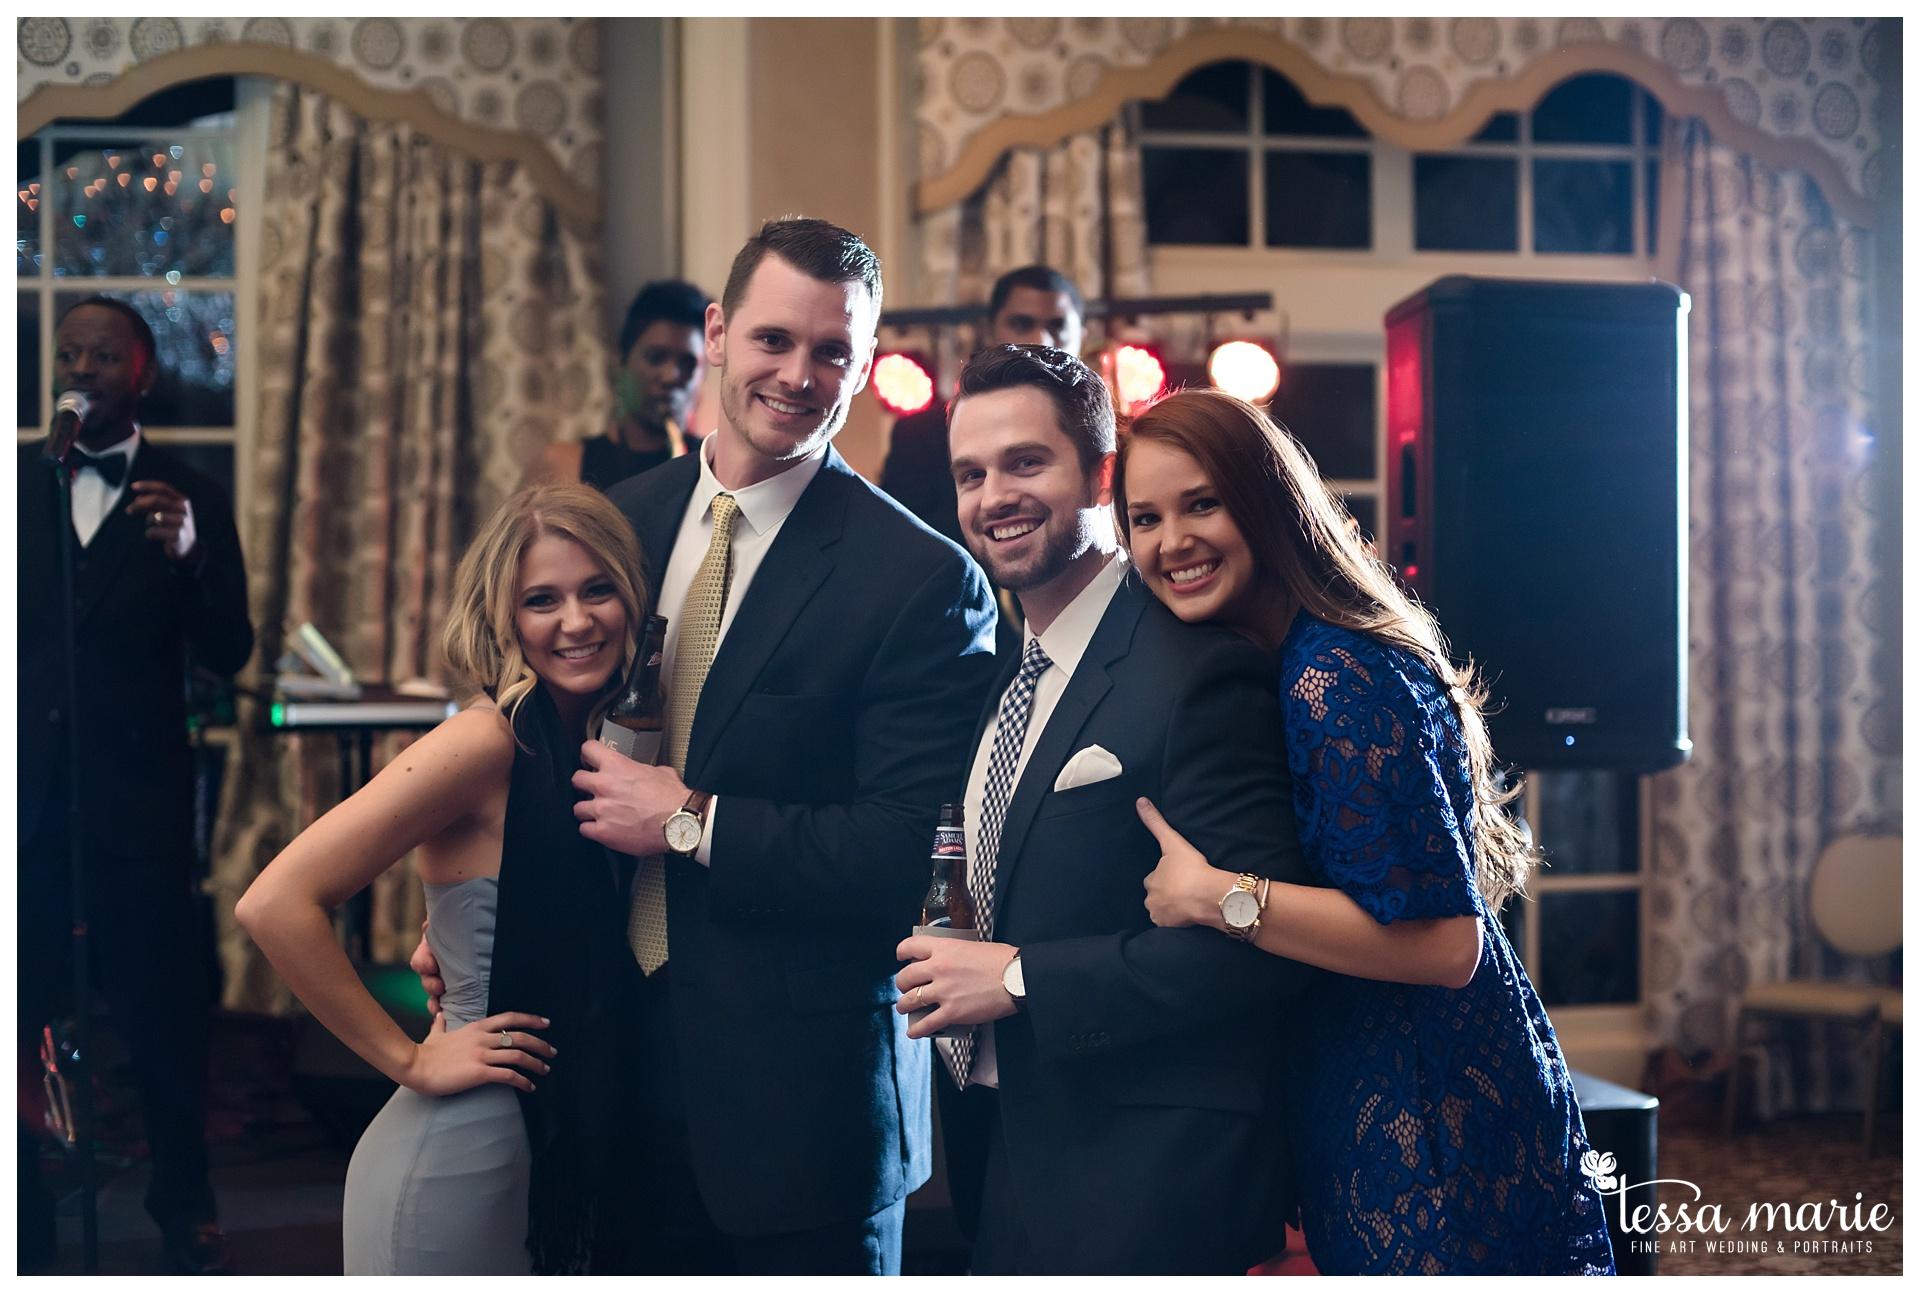 tessa_marie_weddings_legacy_story_focused_wedding_pictures_atlanta_wedding_photographer_0153